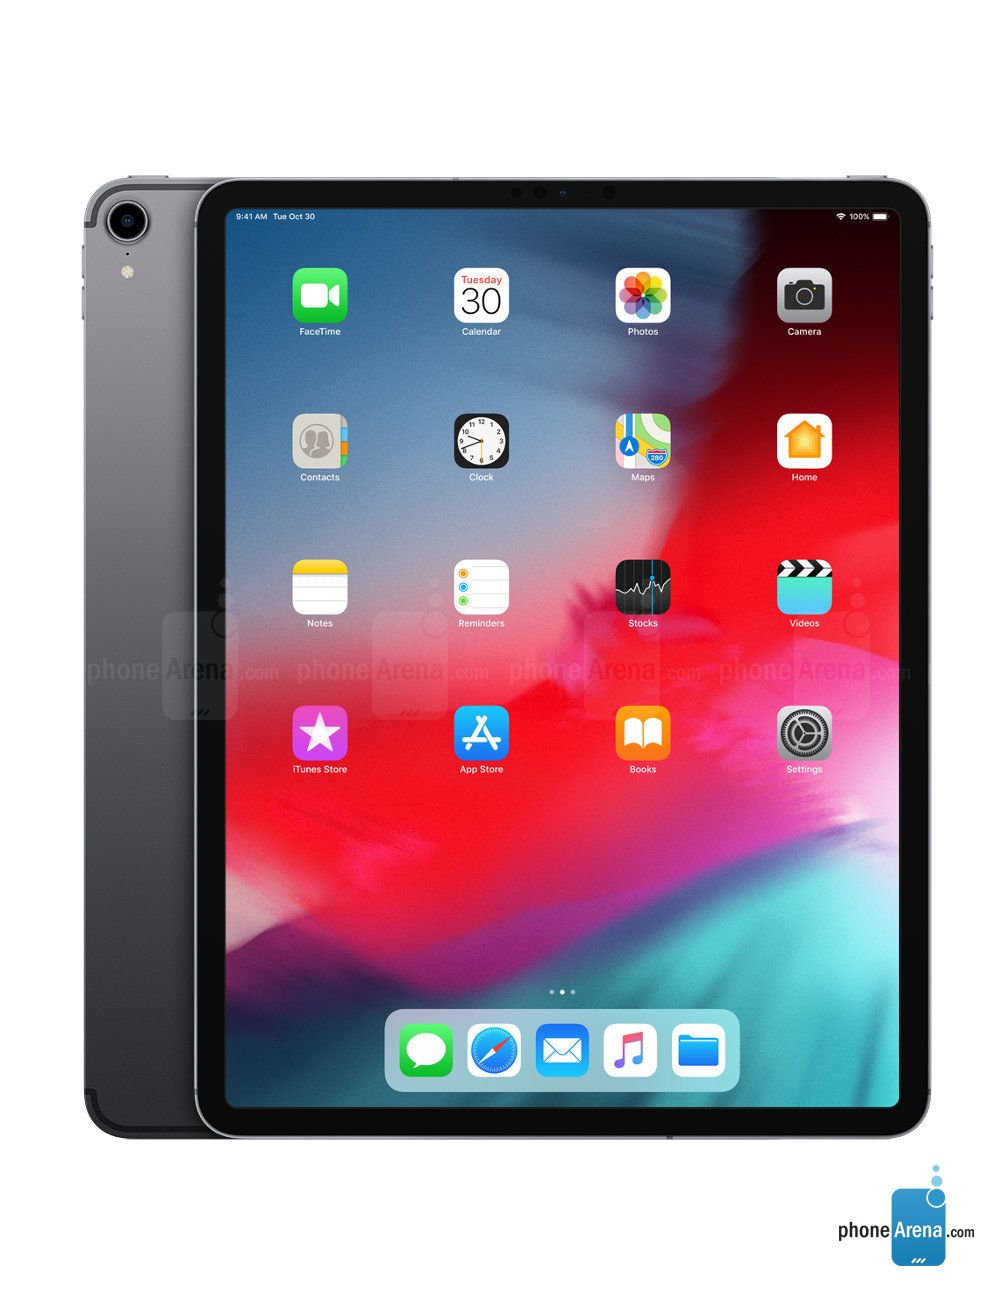 Apple Ipad Pro 12 9 Inch 2018 Ipad Pro 12 New Ipad Pro Apple Ipad Pro